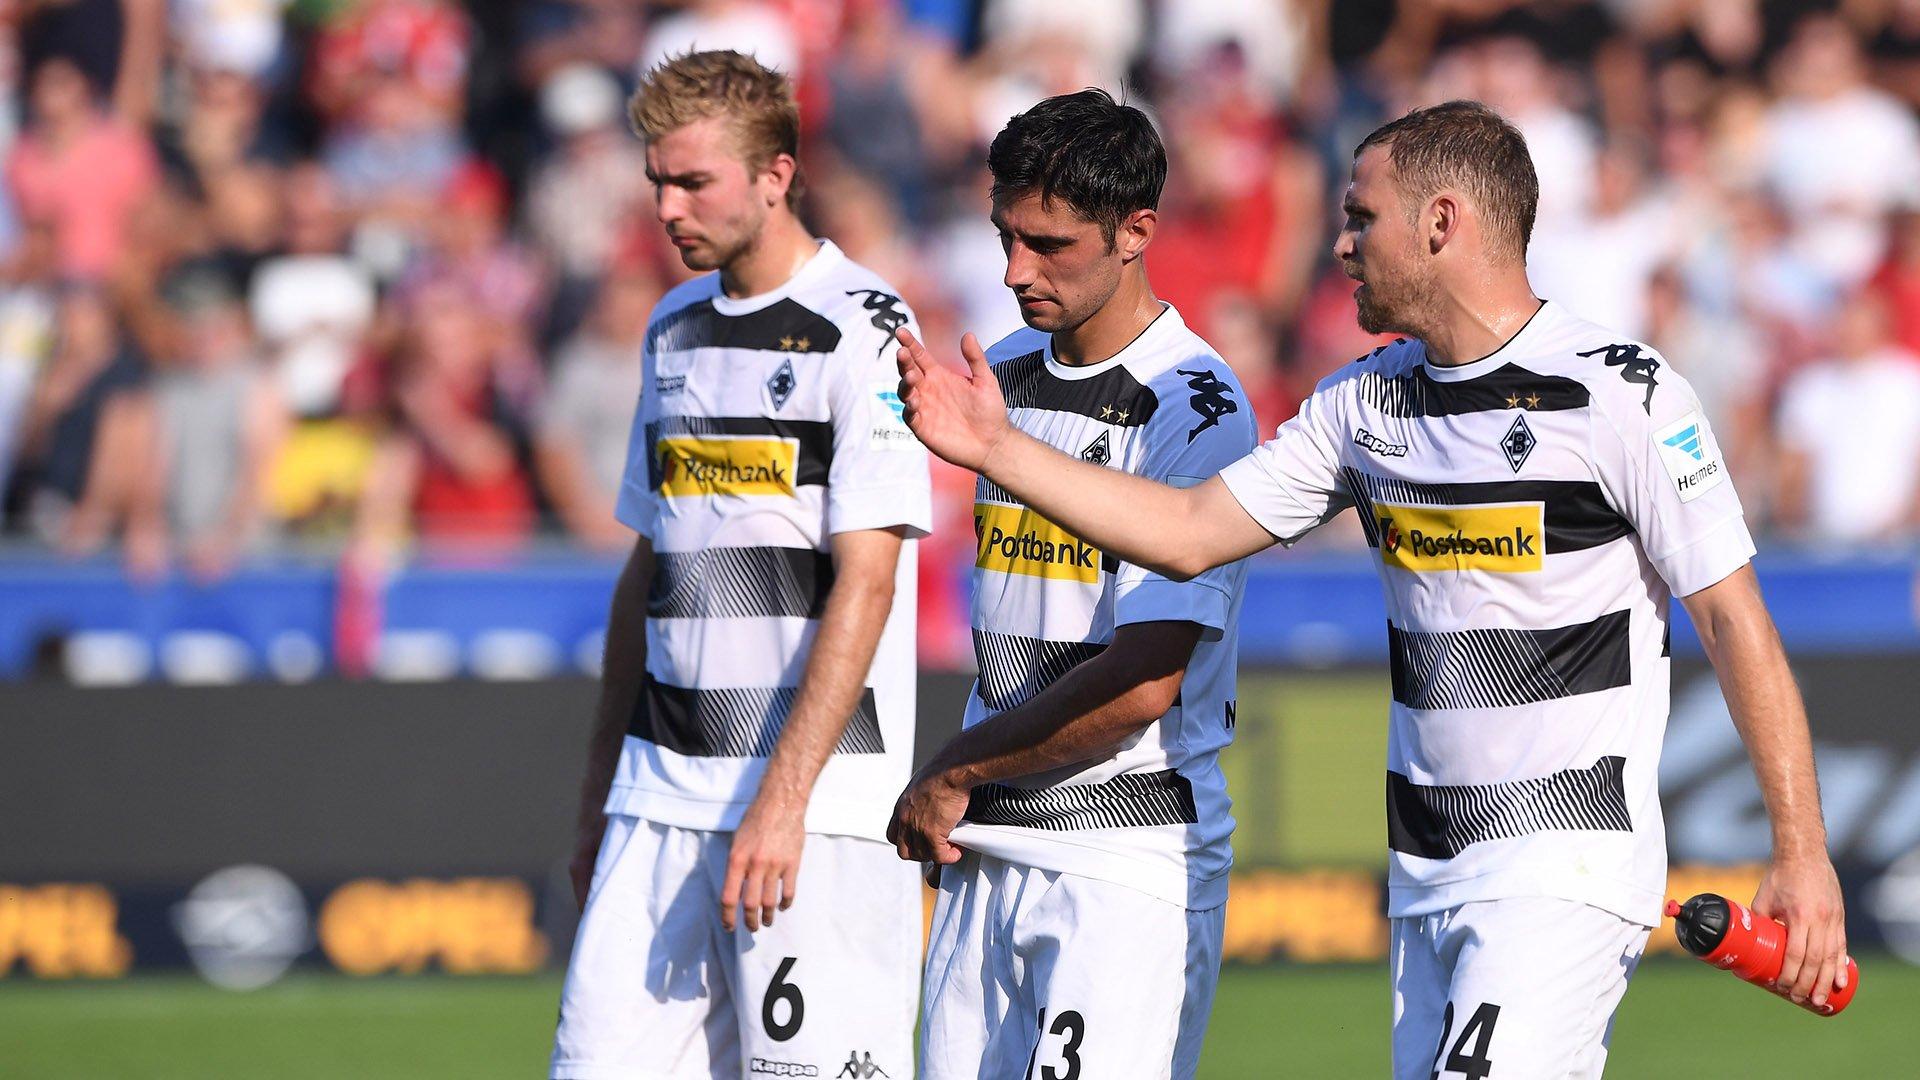 Боруссия Менхенгладбах – Бавария. Прогноз матча чемпионата Германии